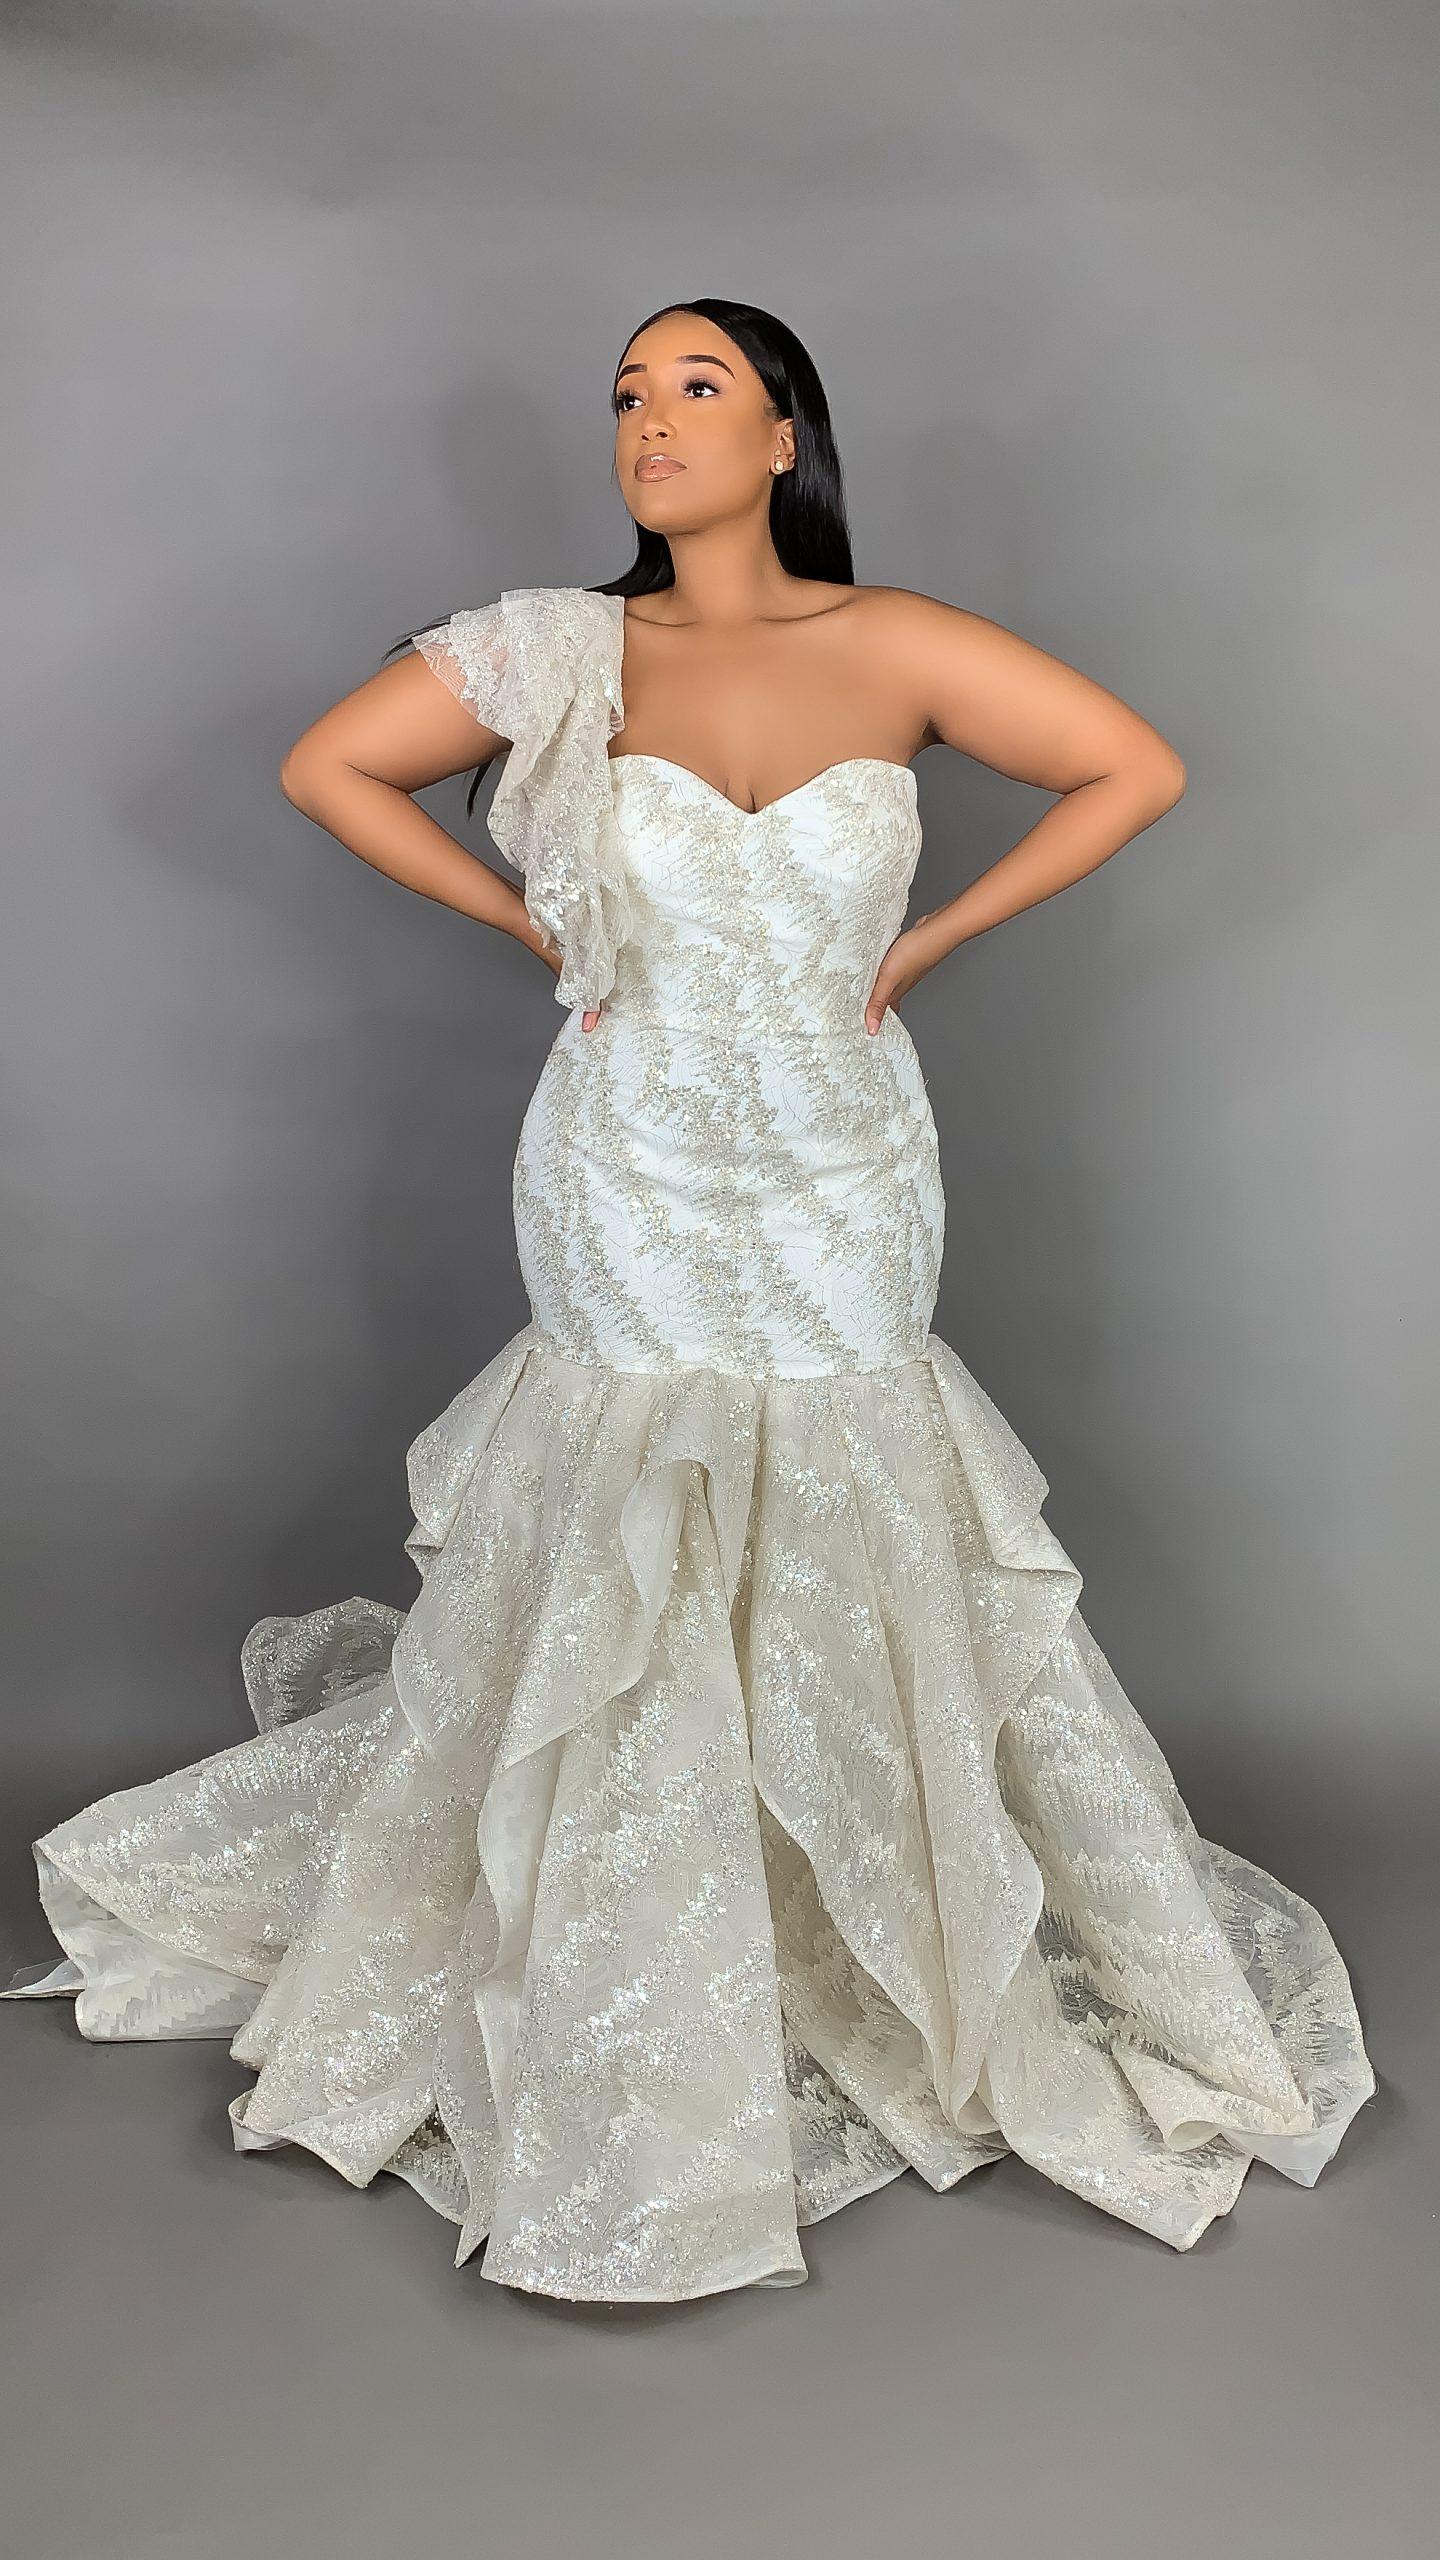 Strapless Sweetheart Neckline Metallic Mermaid Wedding Dress Kleinfeld Bridal